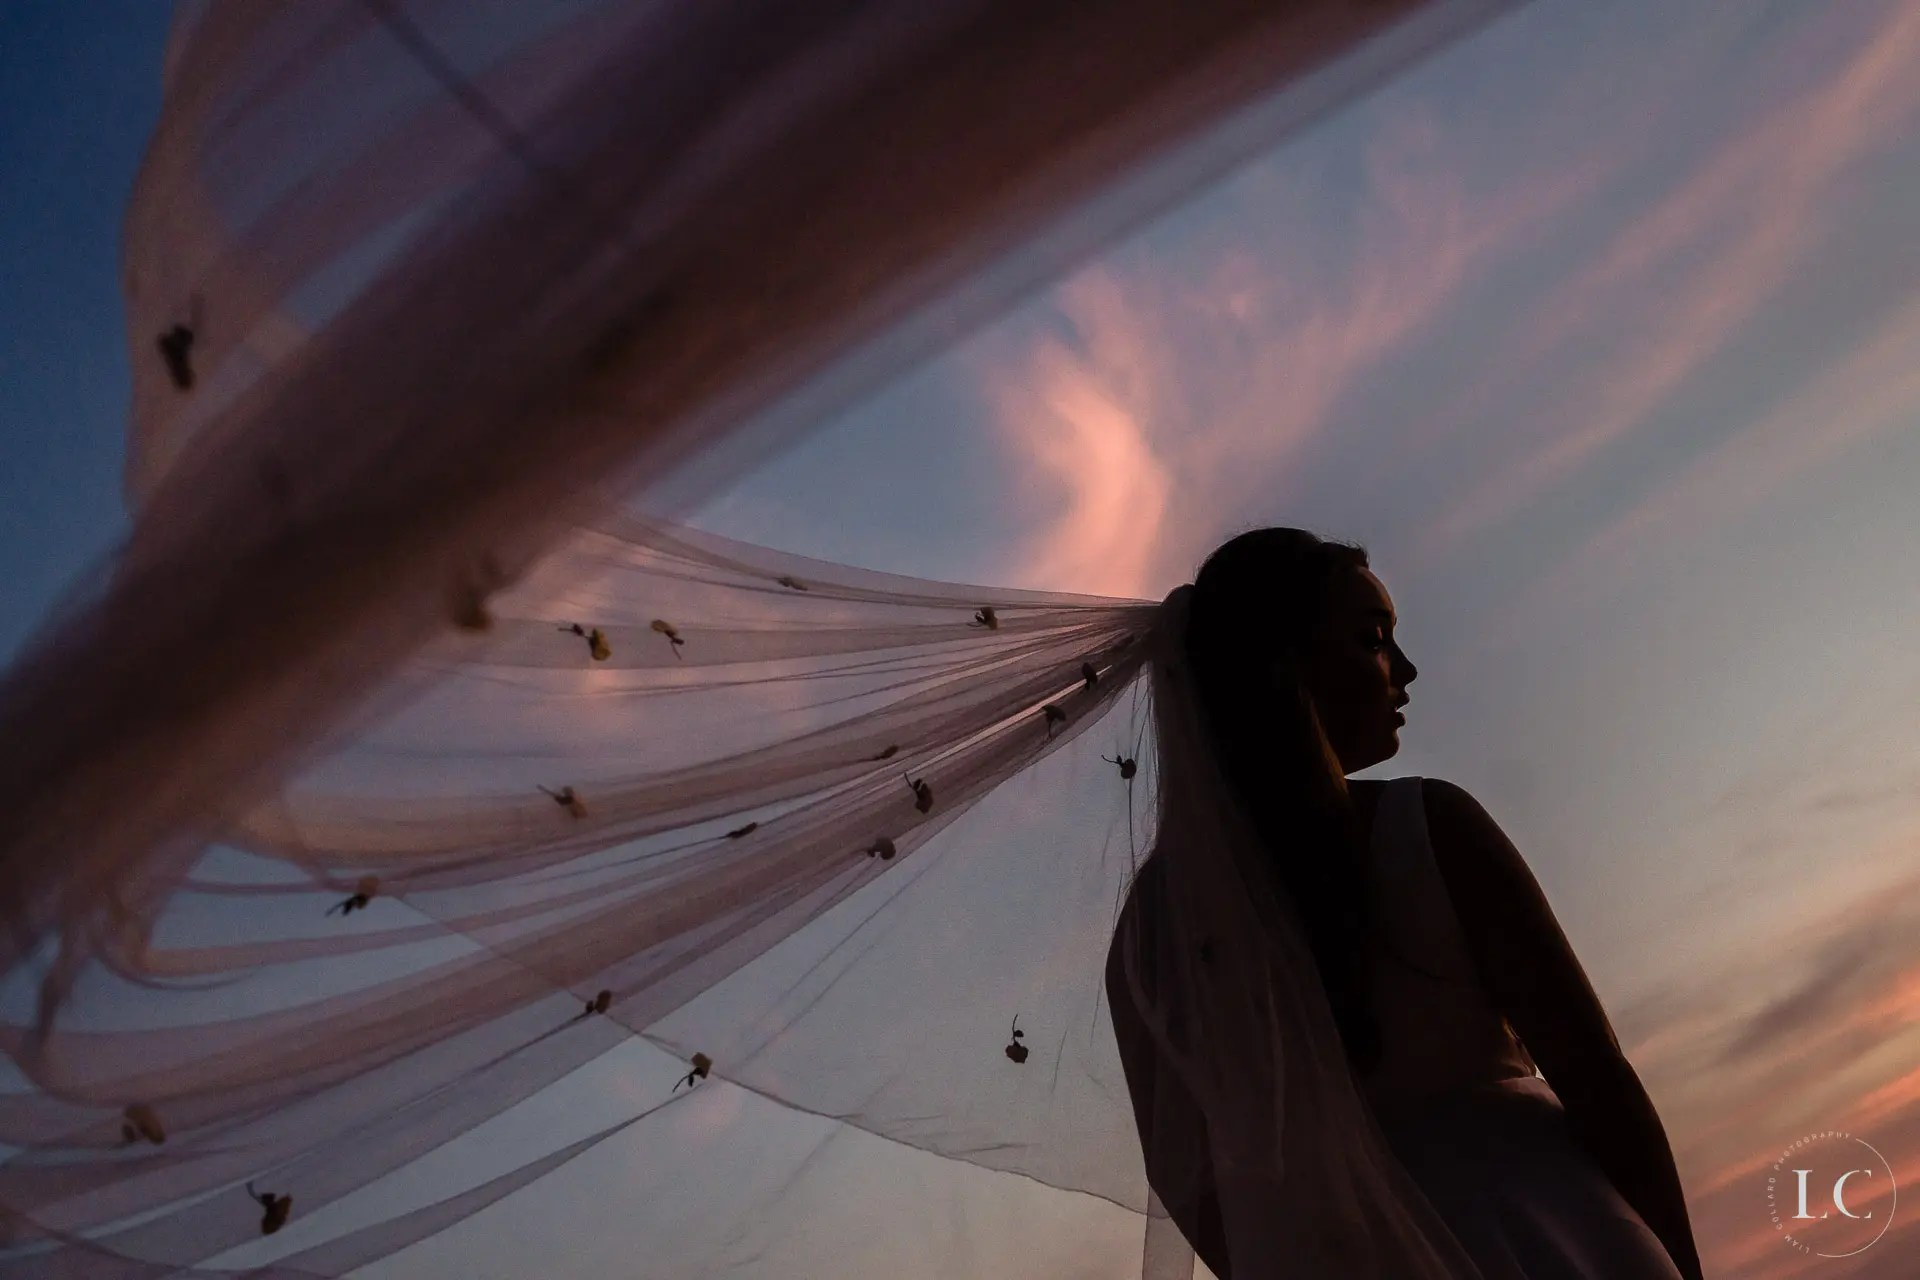 Bride veil in the wind